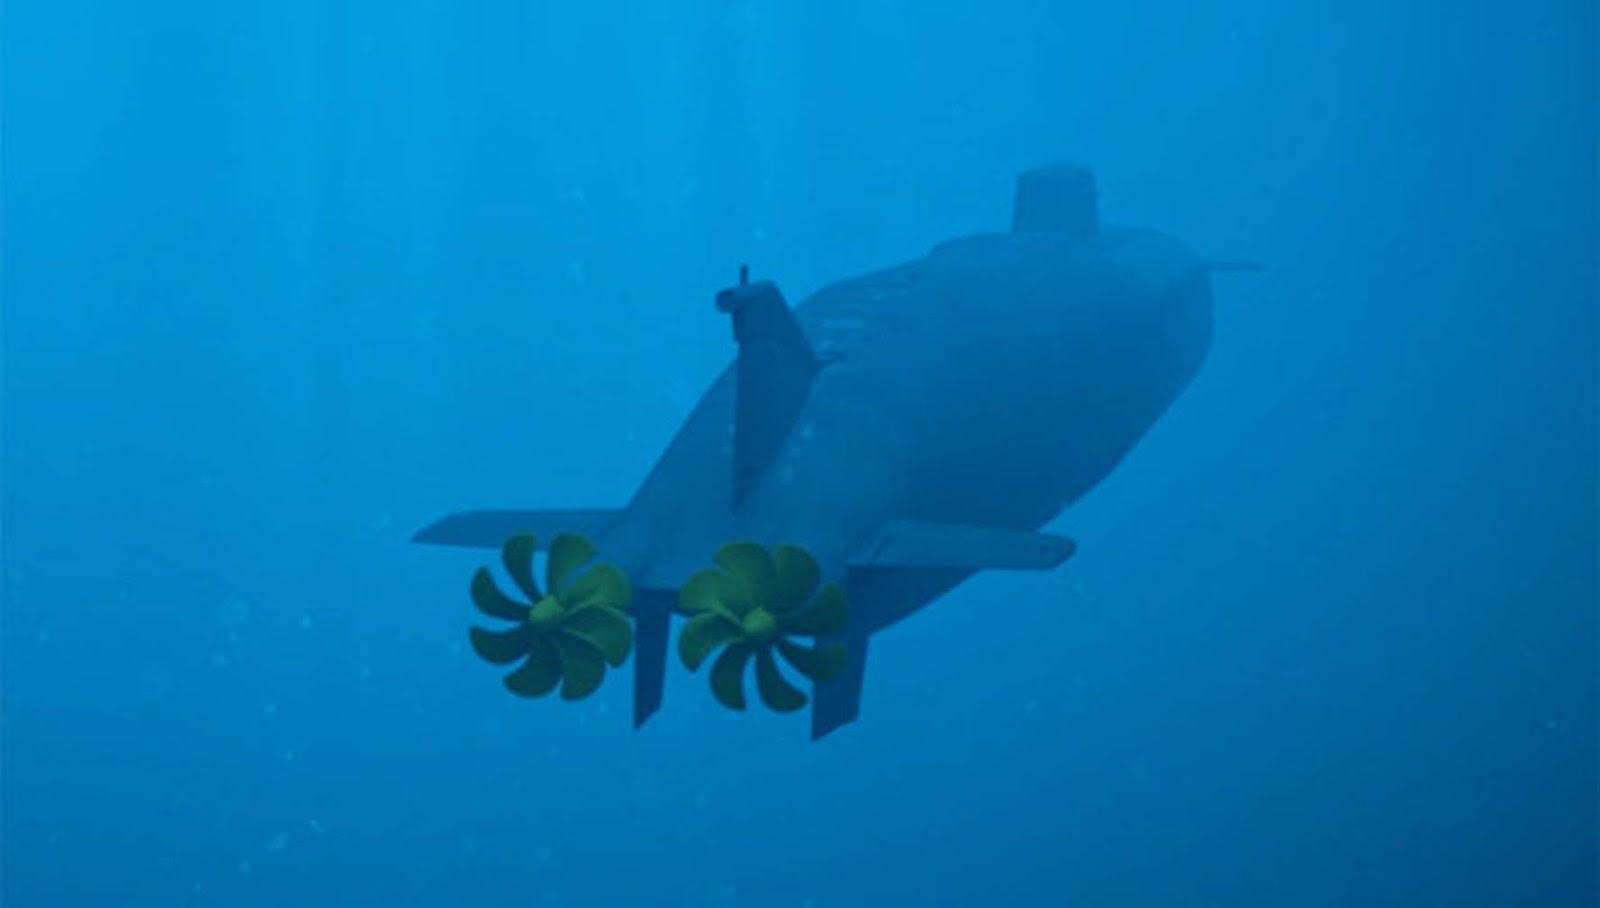 Tsunami radioaktif Poseidon Rusia disebut mesin Kiamat